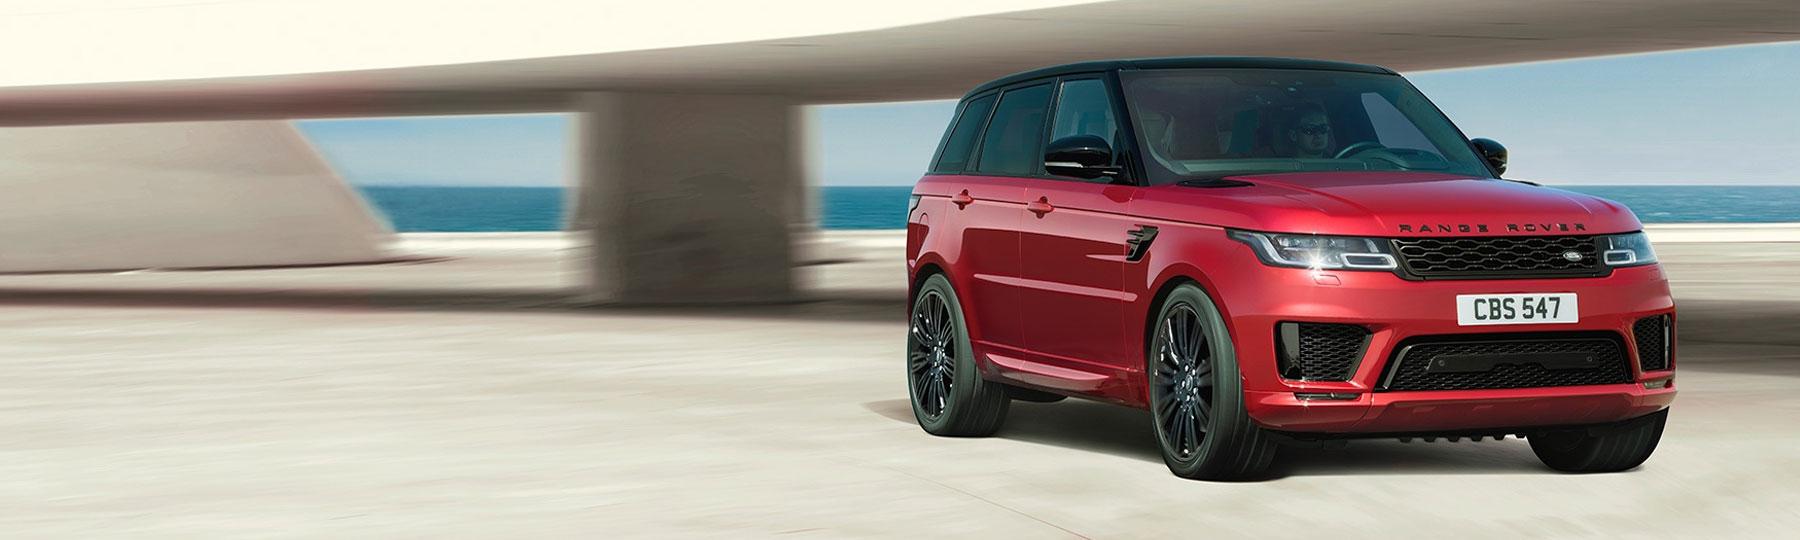 land rover Range Rover Sport New Car Offer